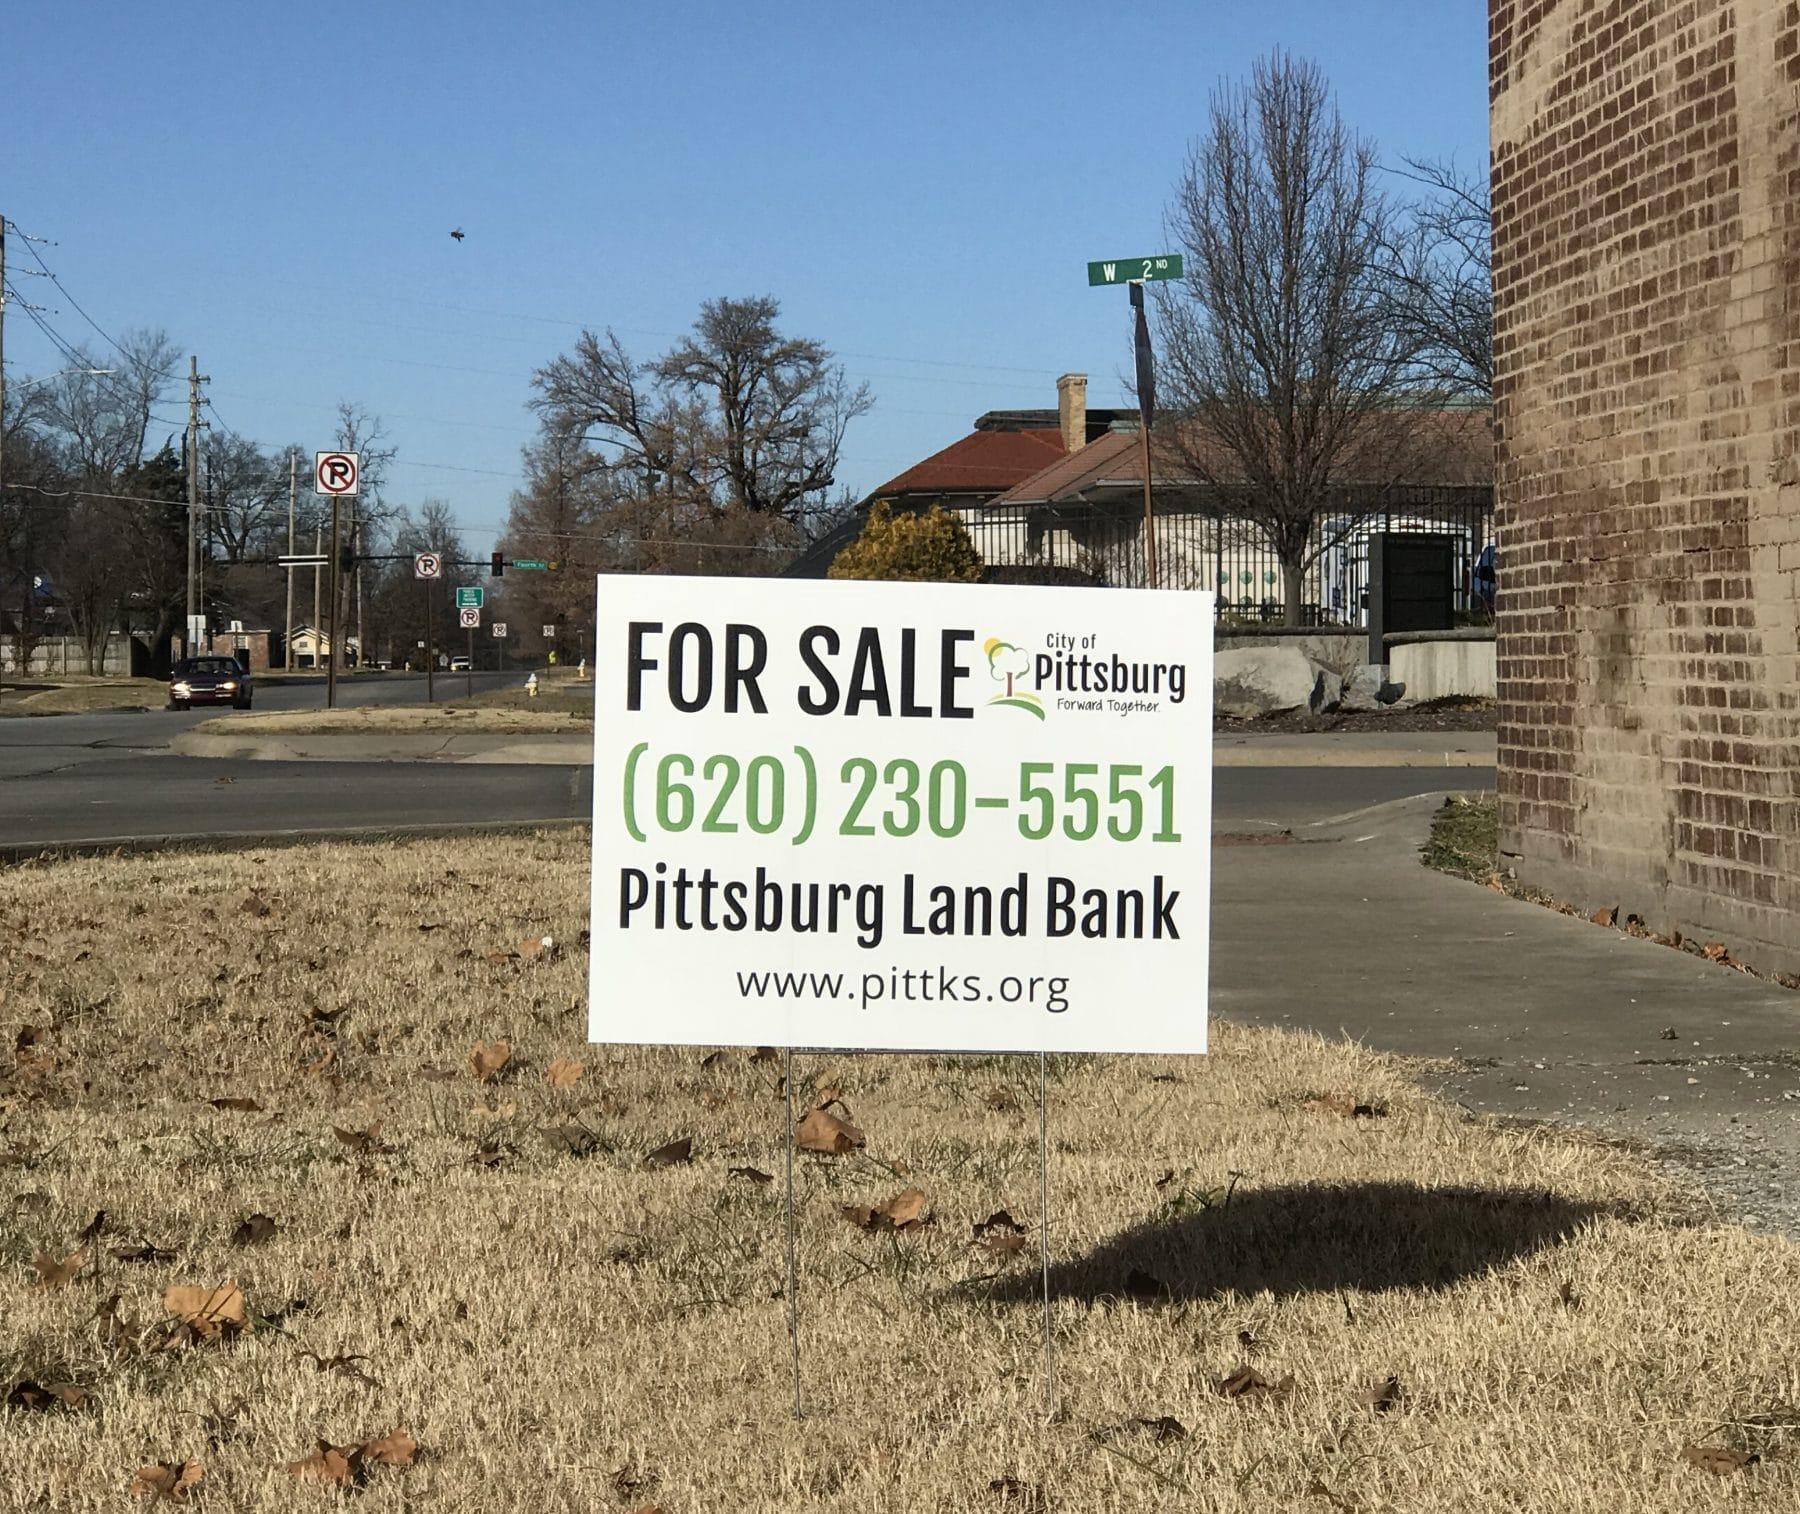 Land bank works to revitalize neighborhoods